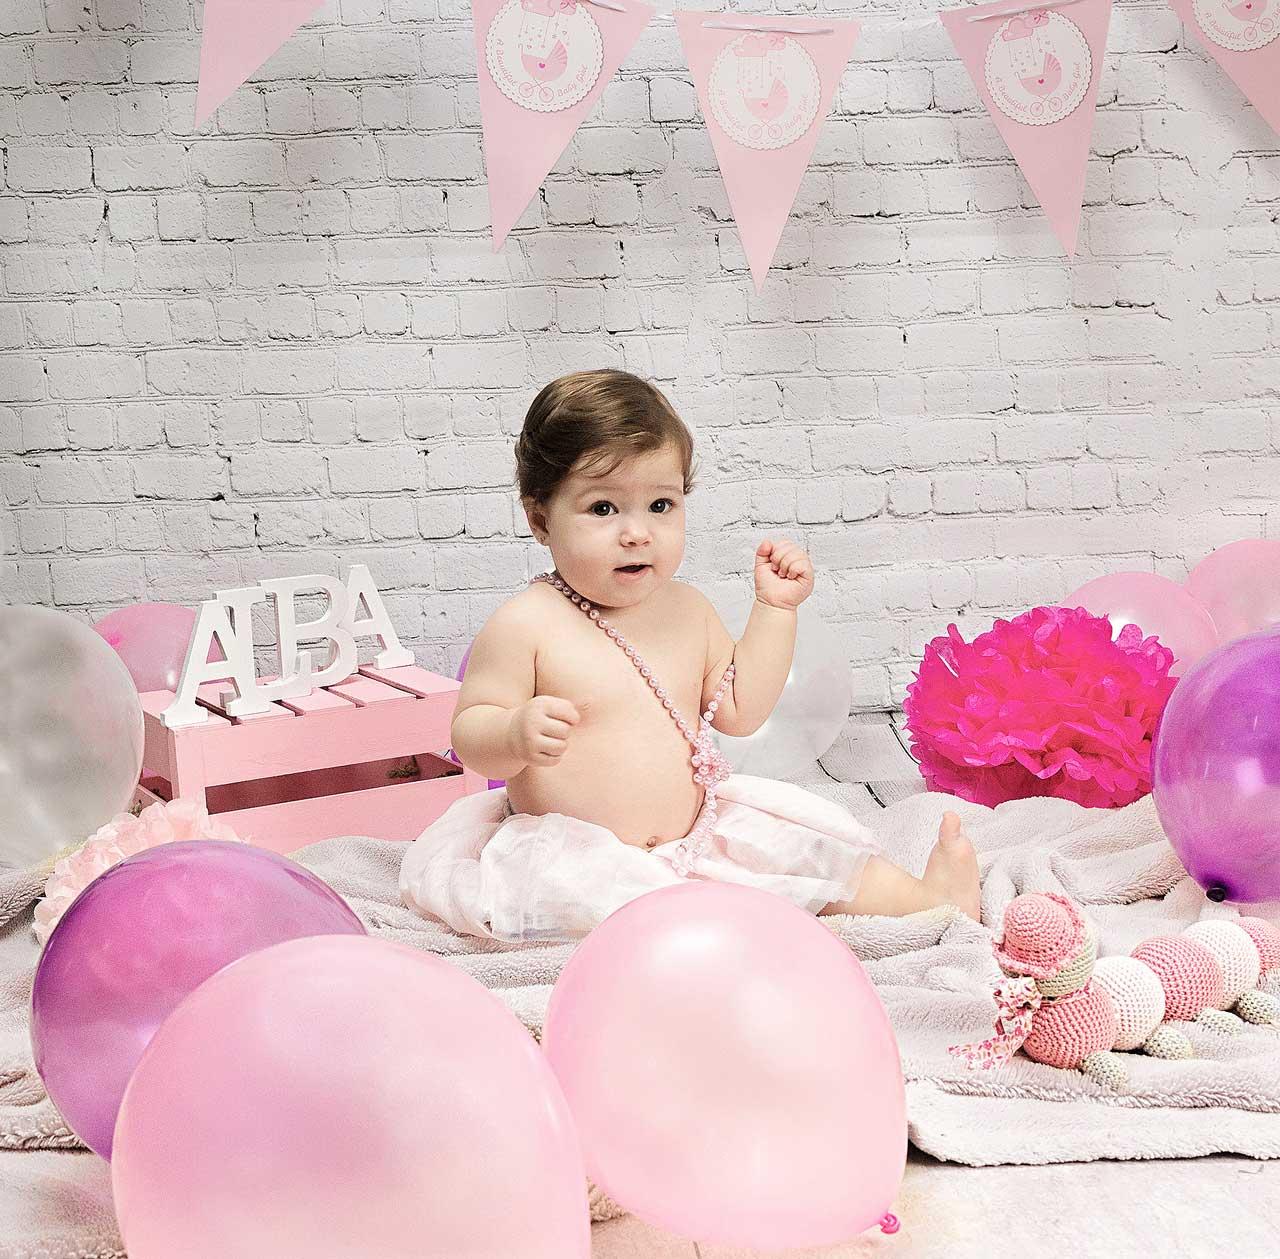 https://www.kidsphotography.es/wp-content/uploads/2021/04/Sesion-Smash-Cake-Alba-8918-©-Kids-Photography.jpg